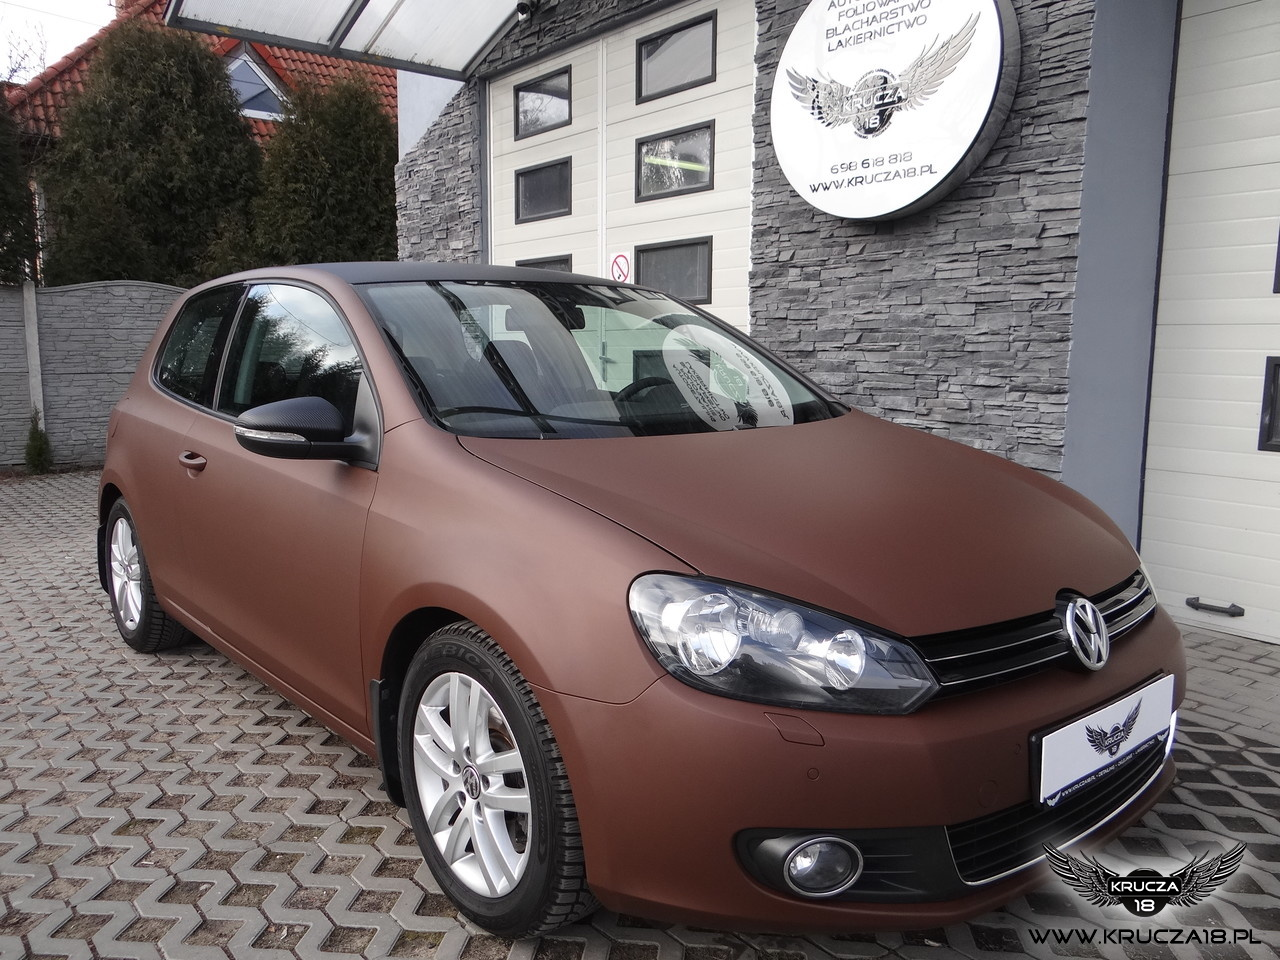 VW GOLF - Chocolate Brown/Arlon